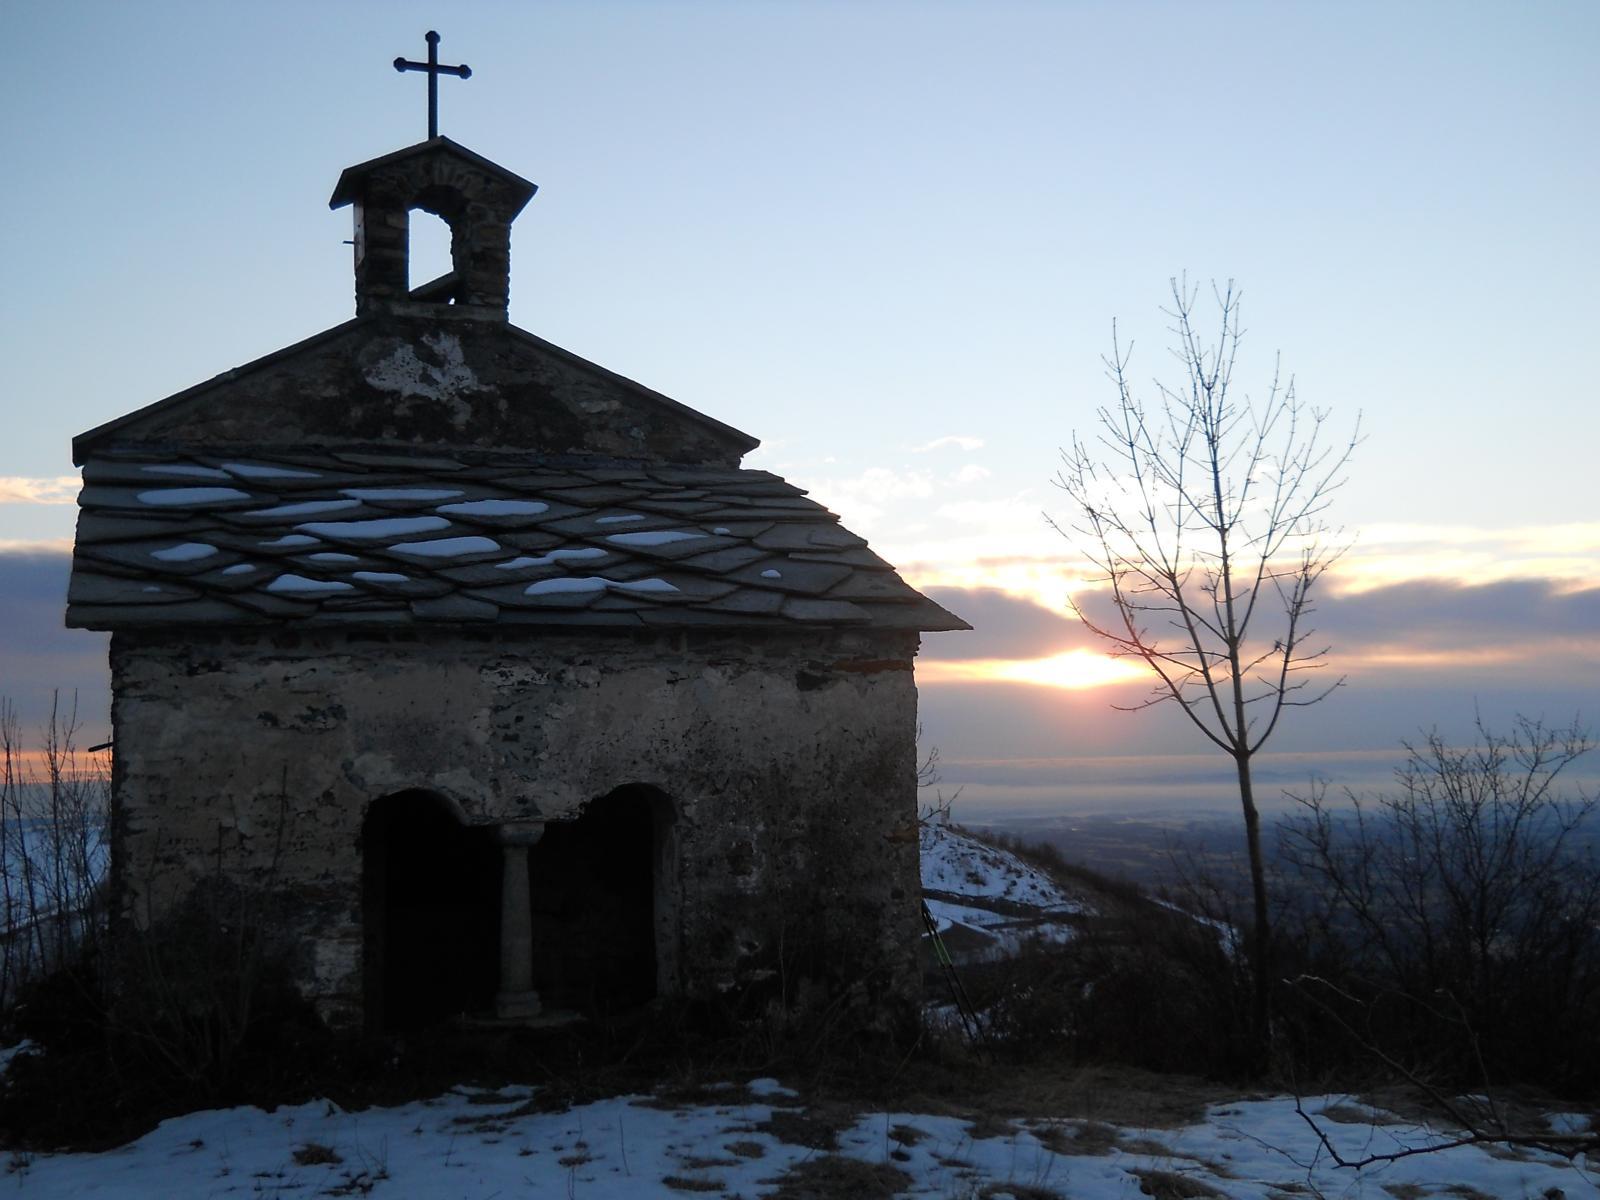 Rolei (Monte) da Benne 2014-02-09